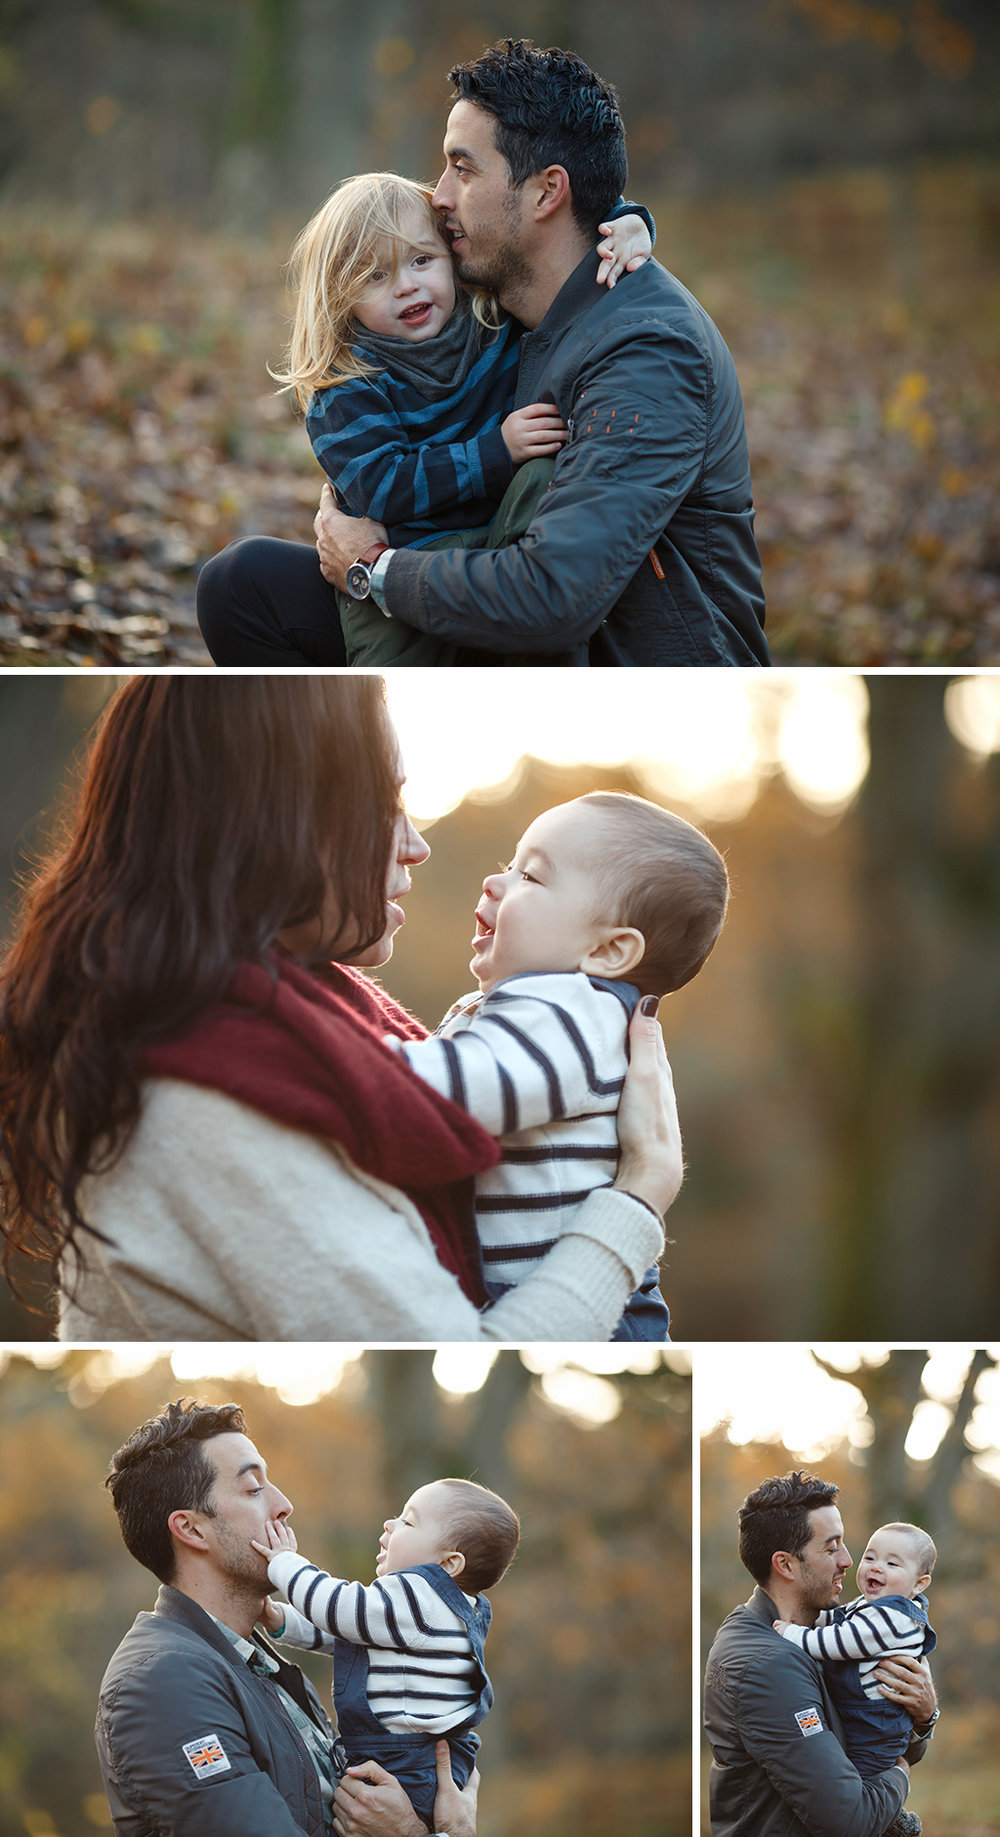 Hostfotografering-i-november-familjefotografering-Stockholm-6.jpg